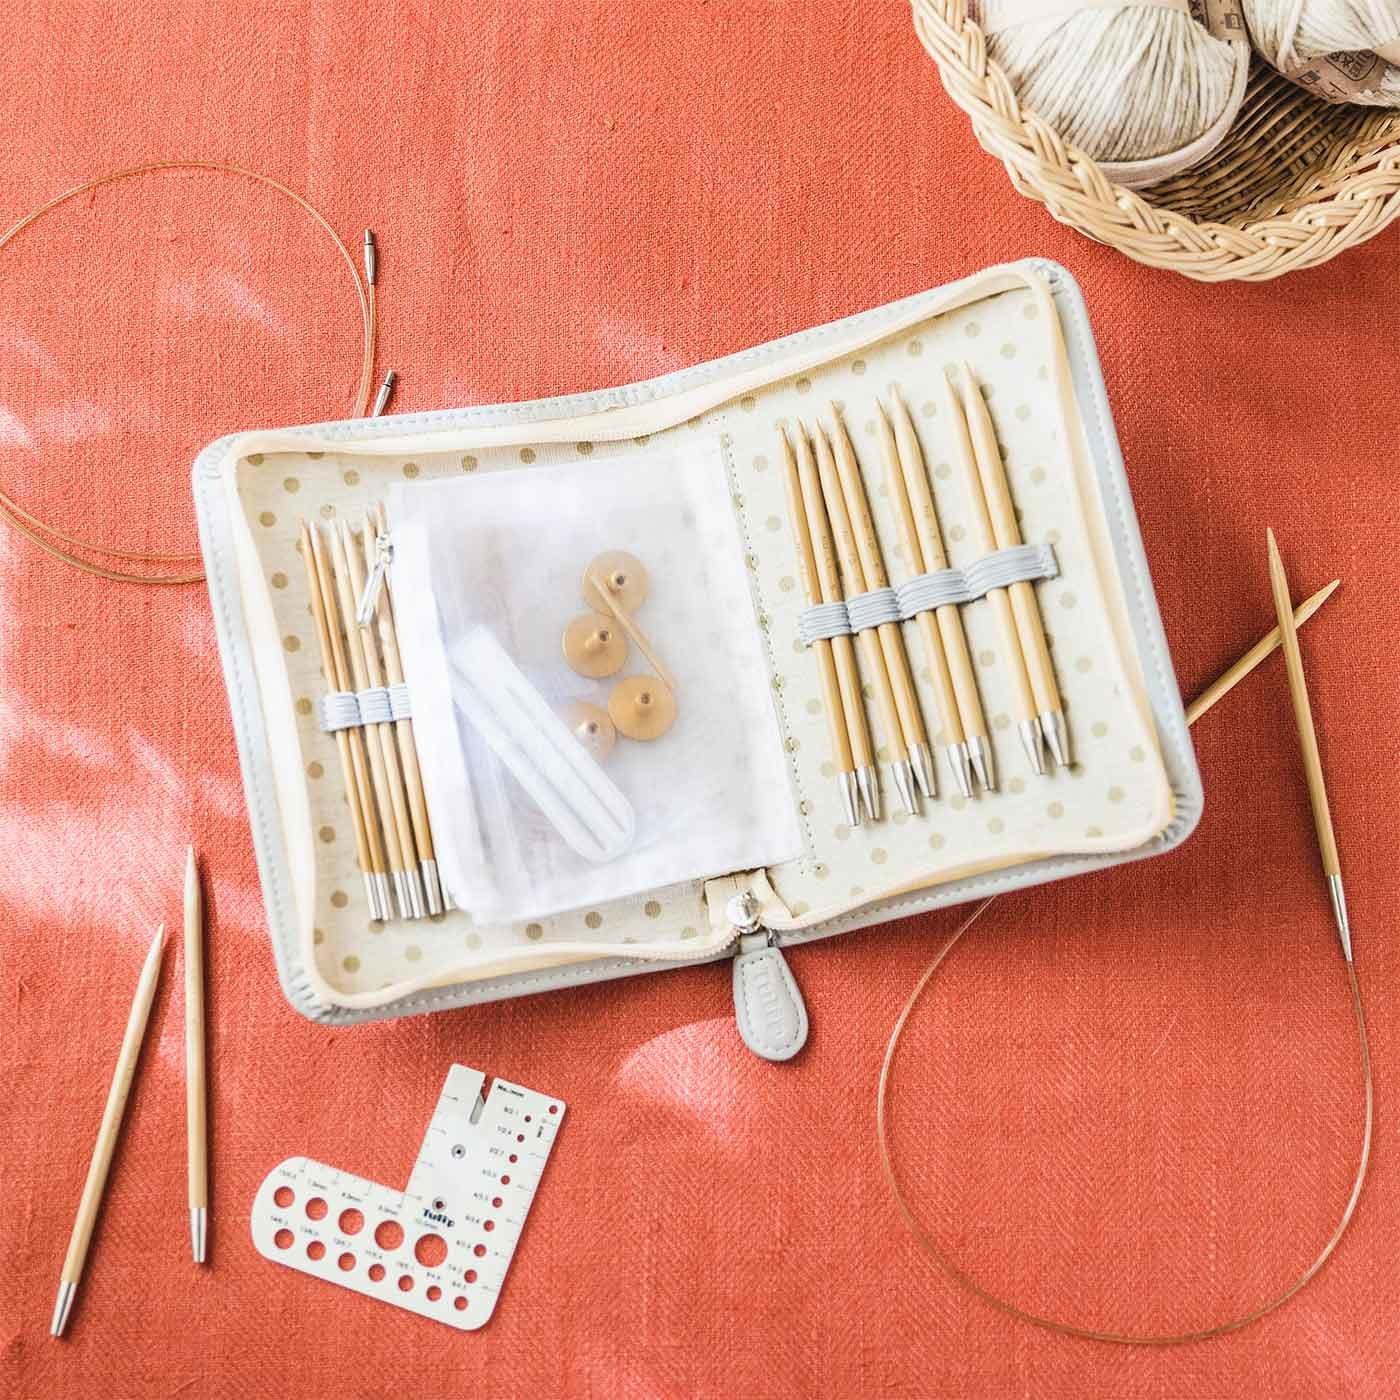 Tulip キャリーシーロング 切り替え式竹輪針セット